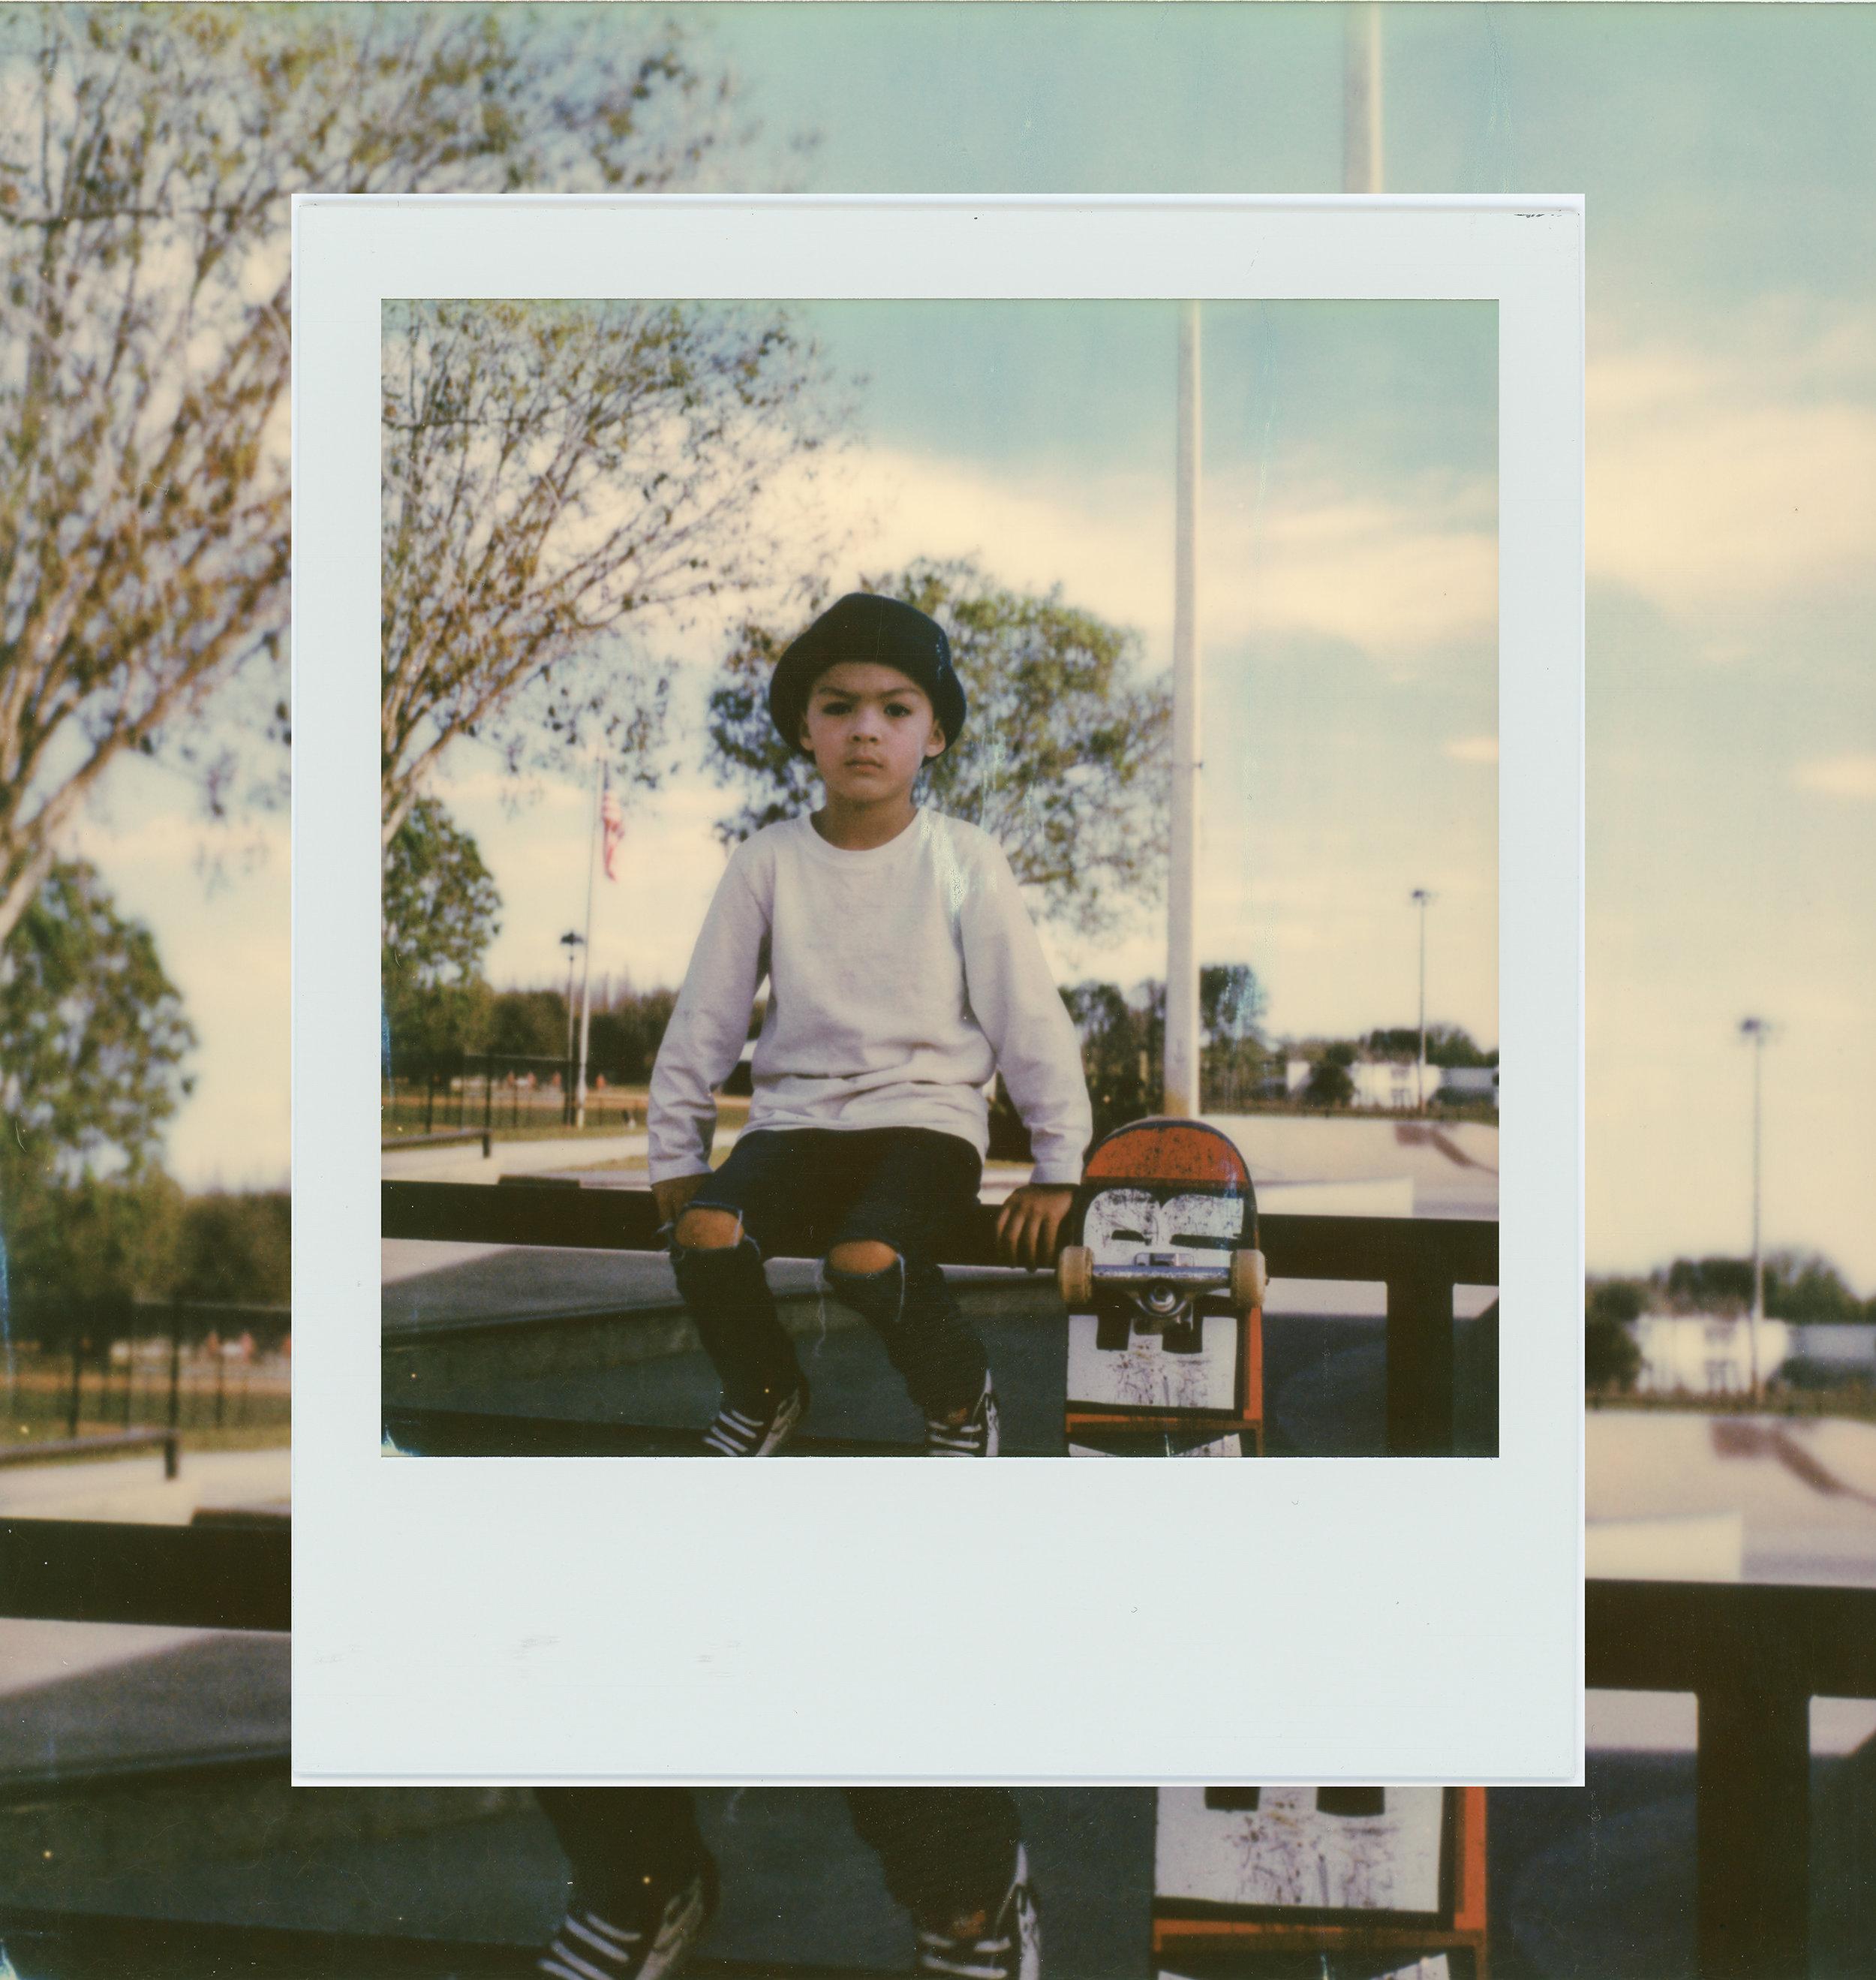 Liam-2-18-19_Polaroid.jpg